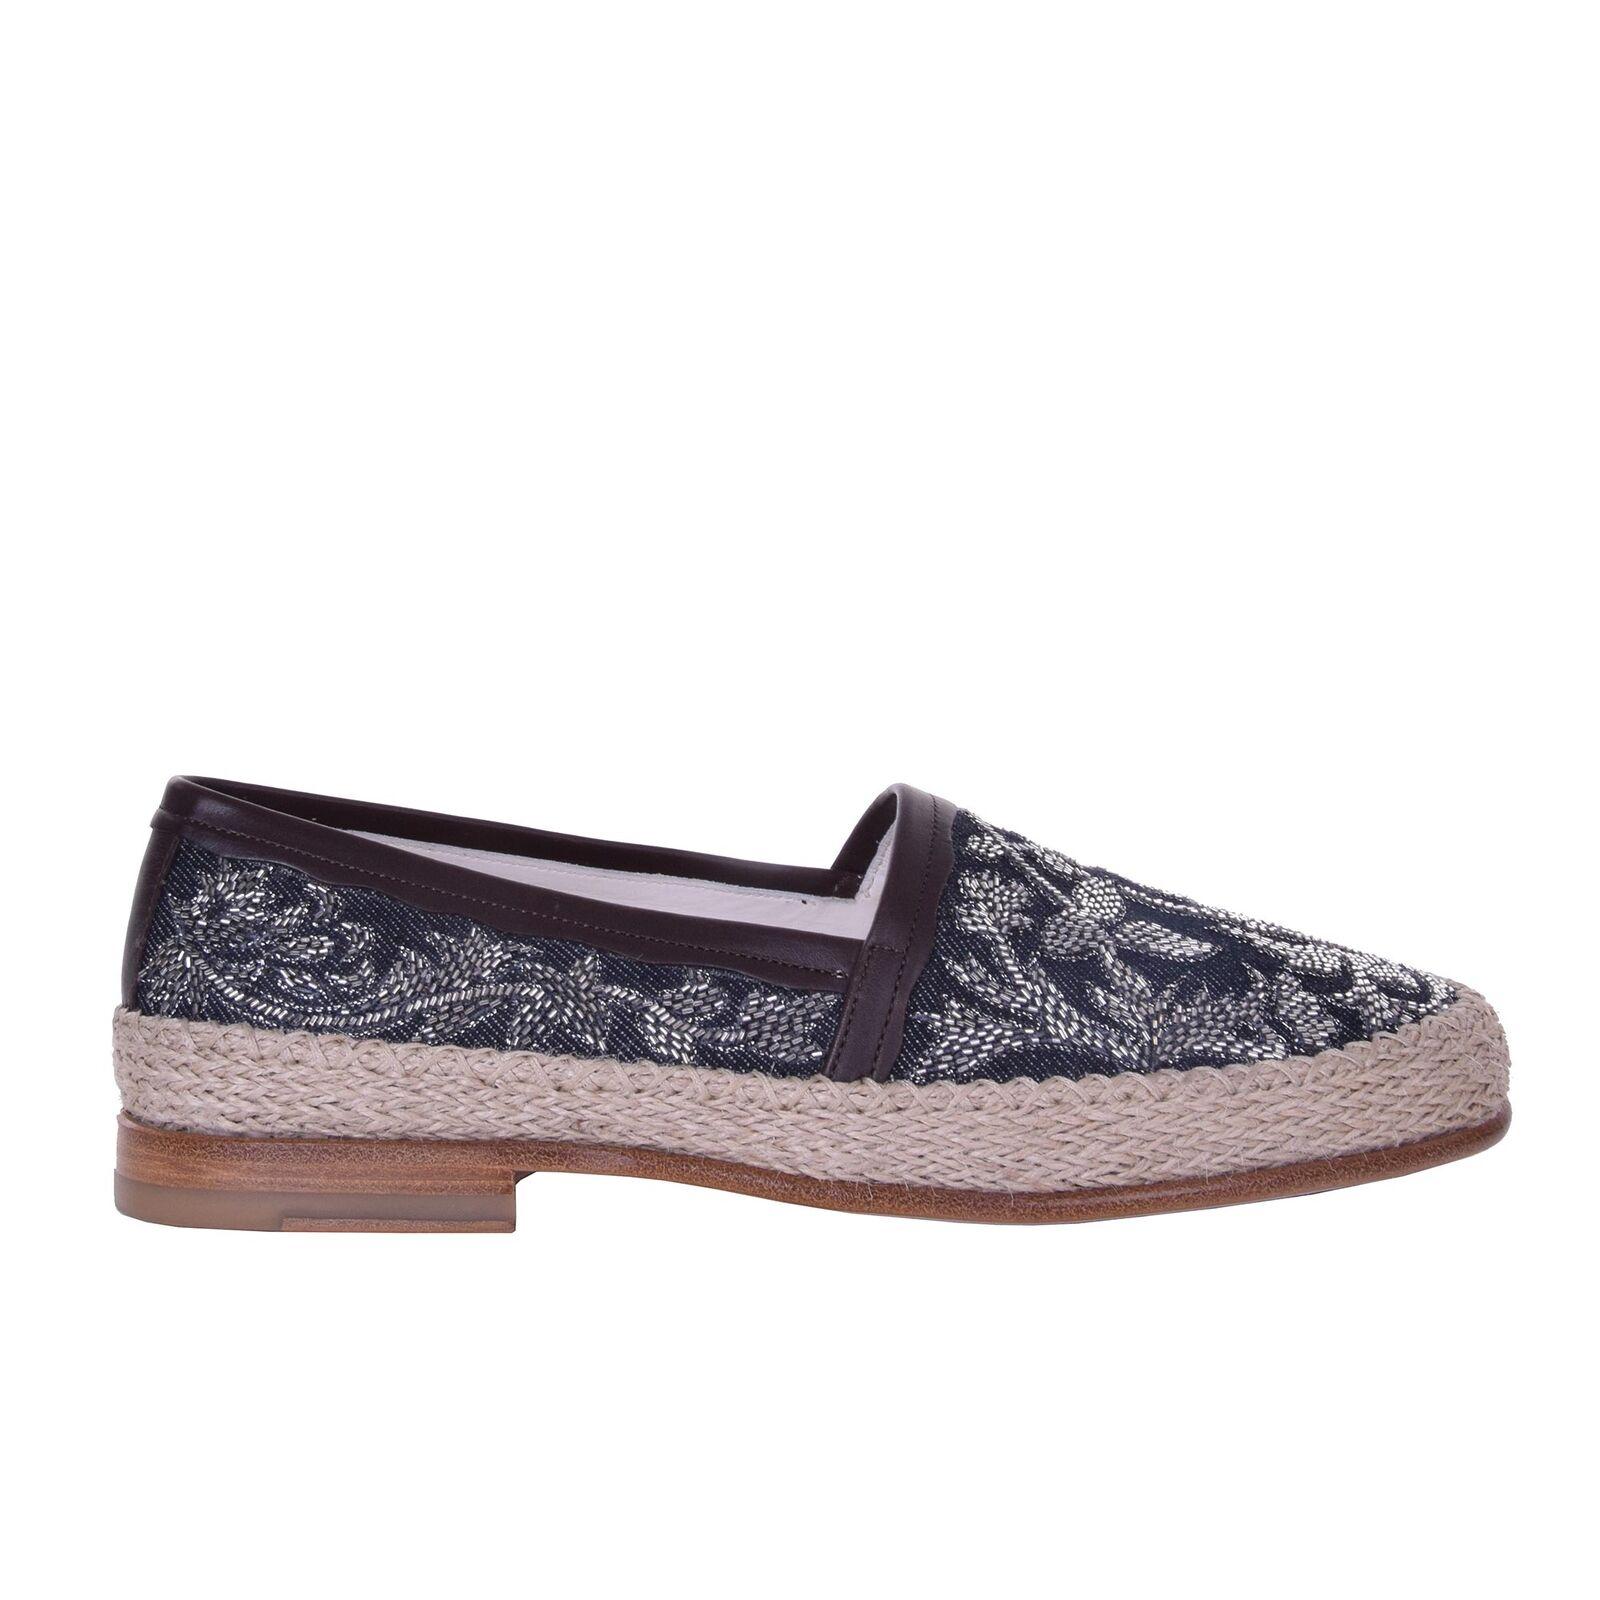 DOLCE & GABBANA Pearls Jeans Espadrilles Shoes PIANOSA Black Beige 06232